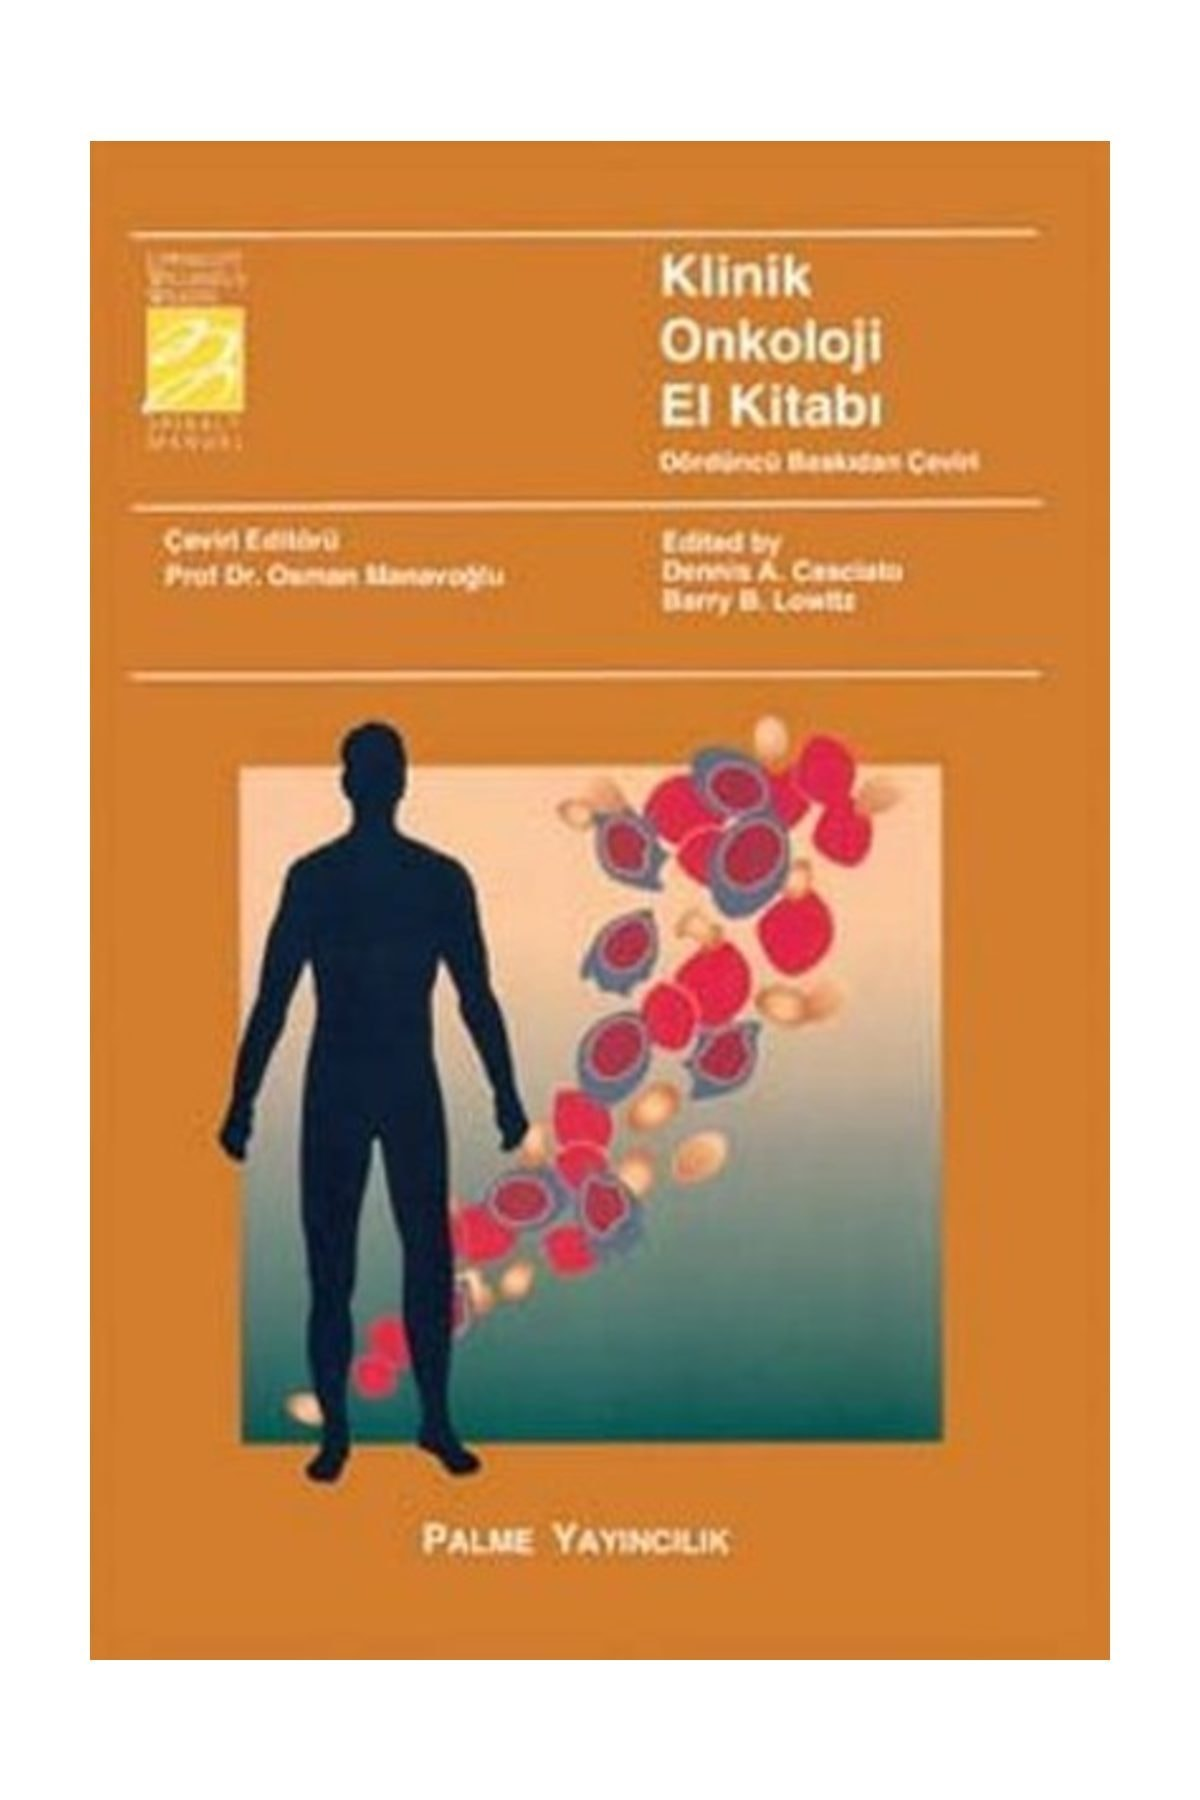 Palme Yayınevi Klinik Onkoloji El Kitabı - Dennis A. Casciato 1